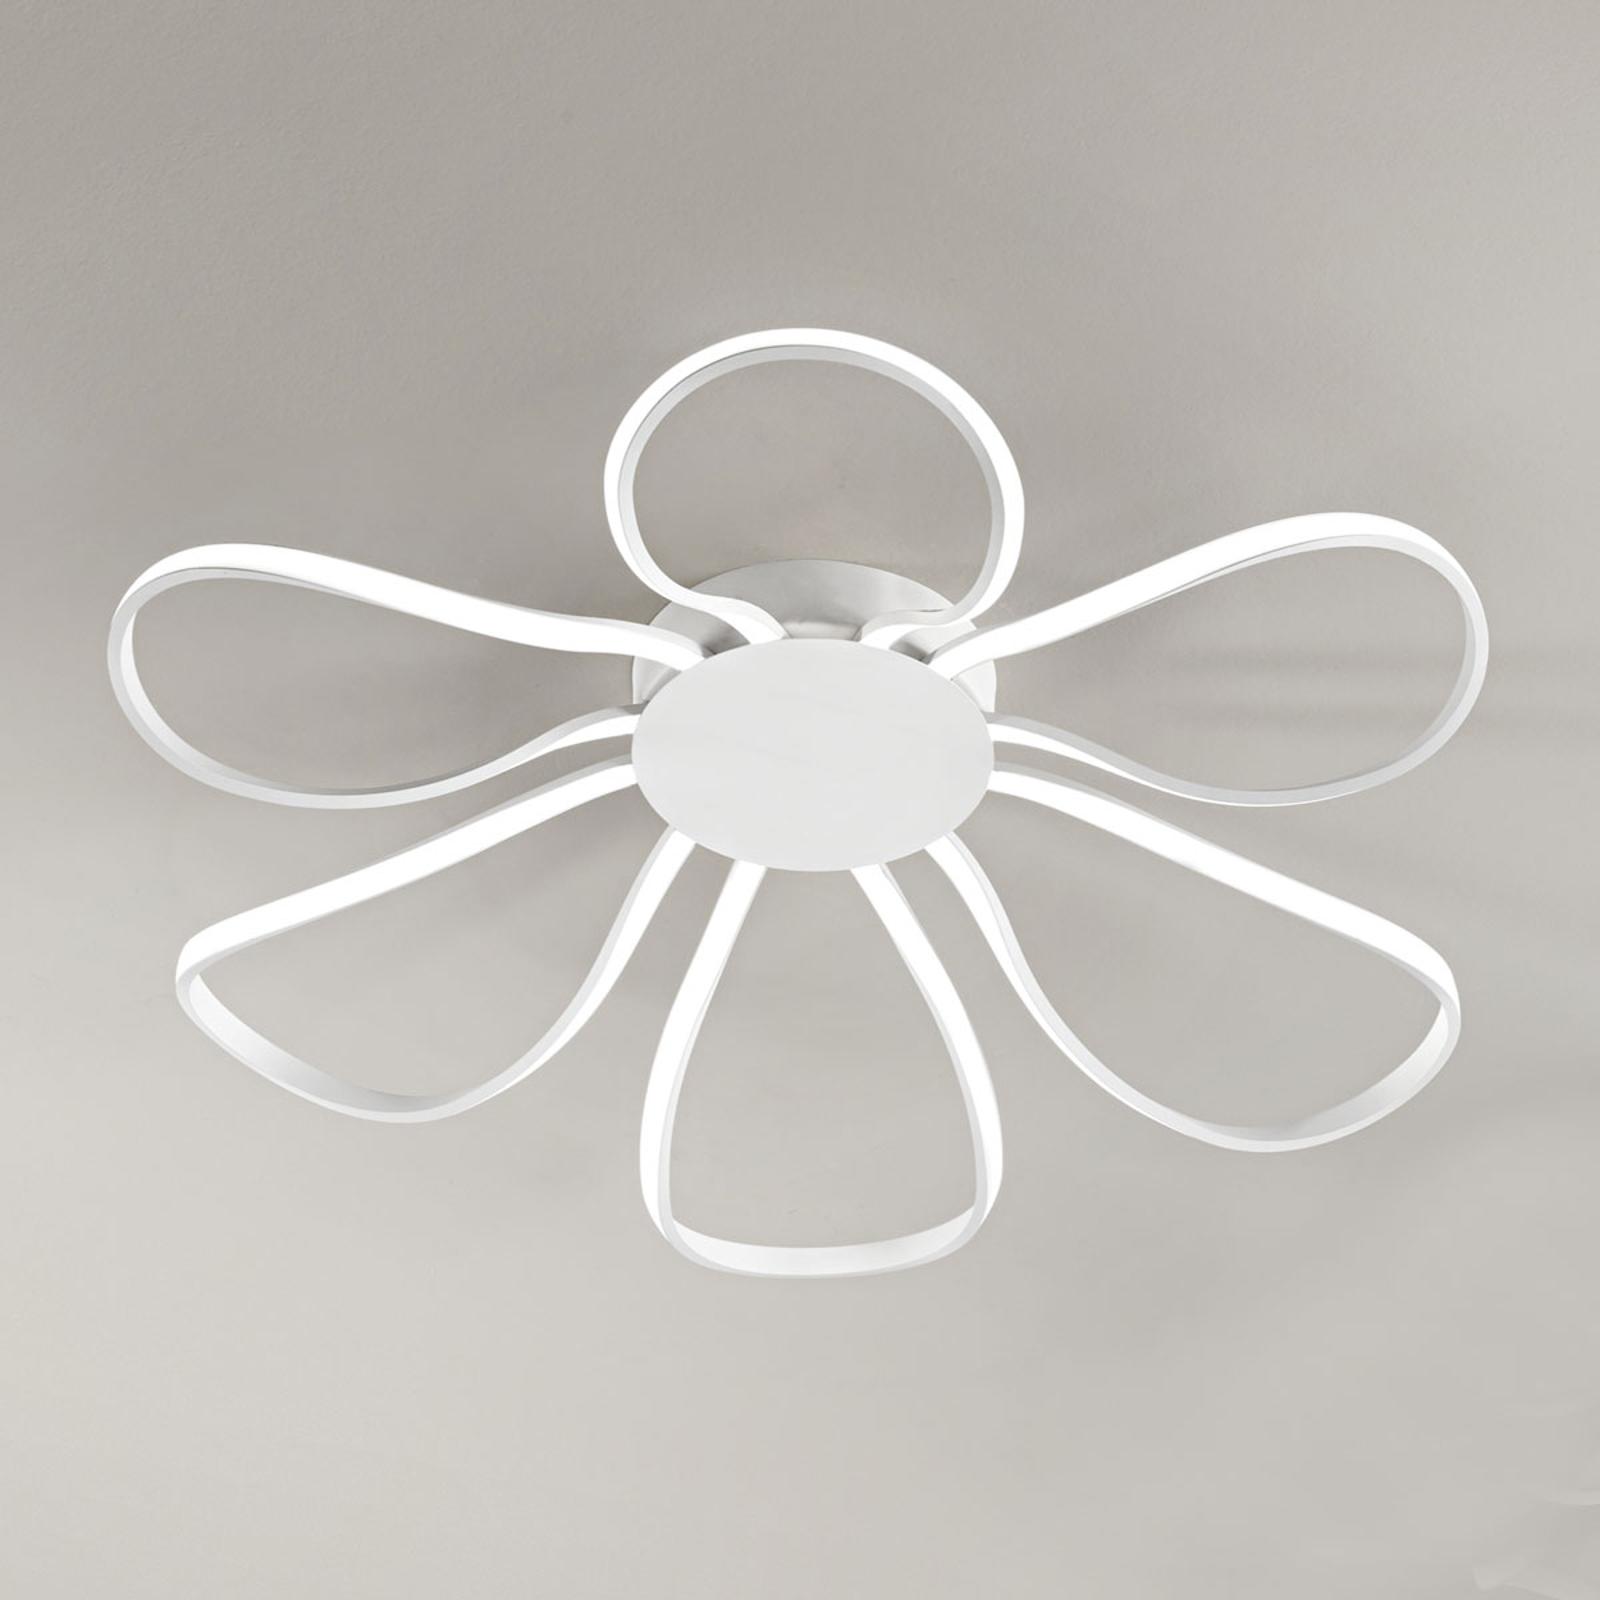 Lampa sufitowa LED Blossom, Ø 62 cm